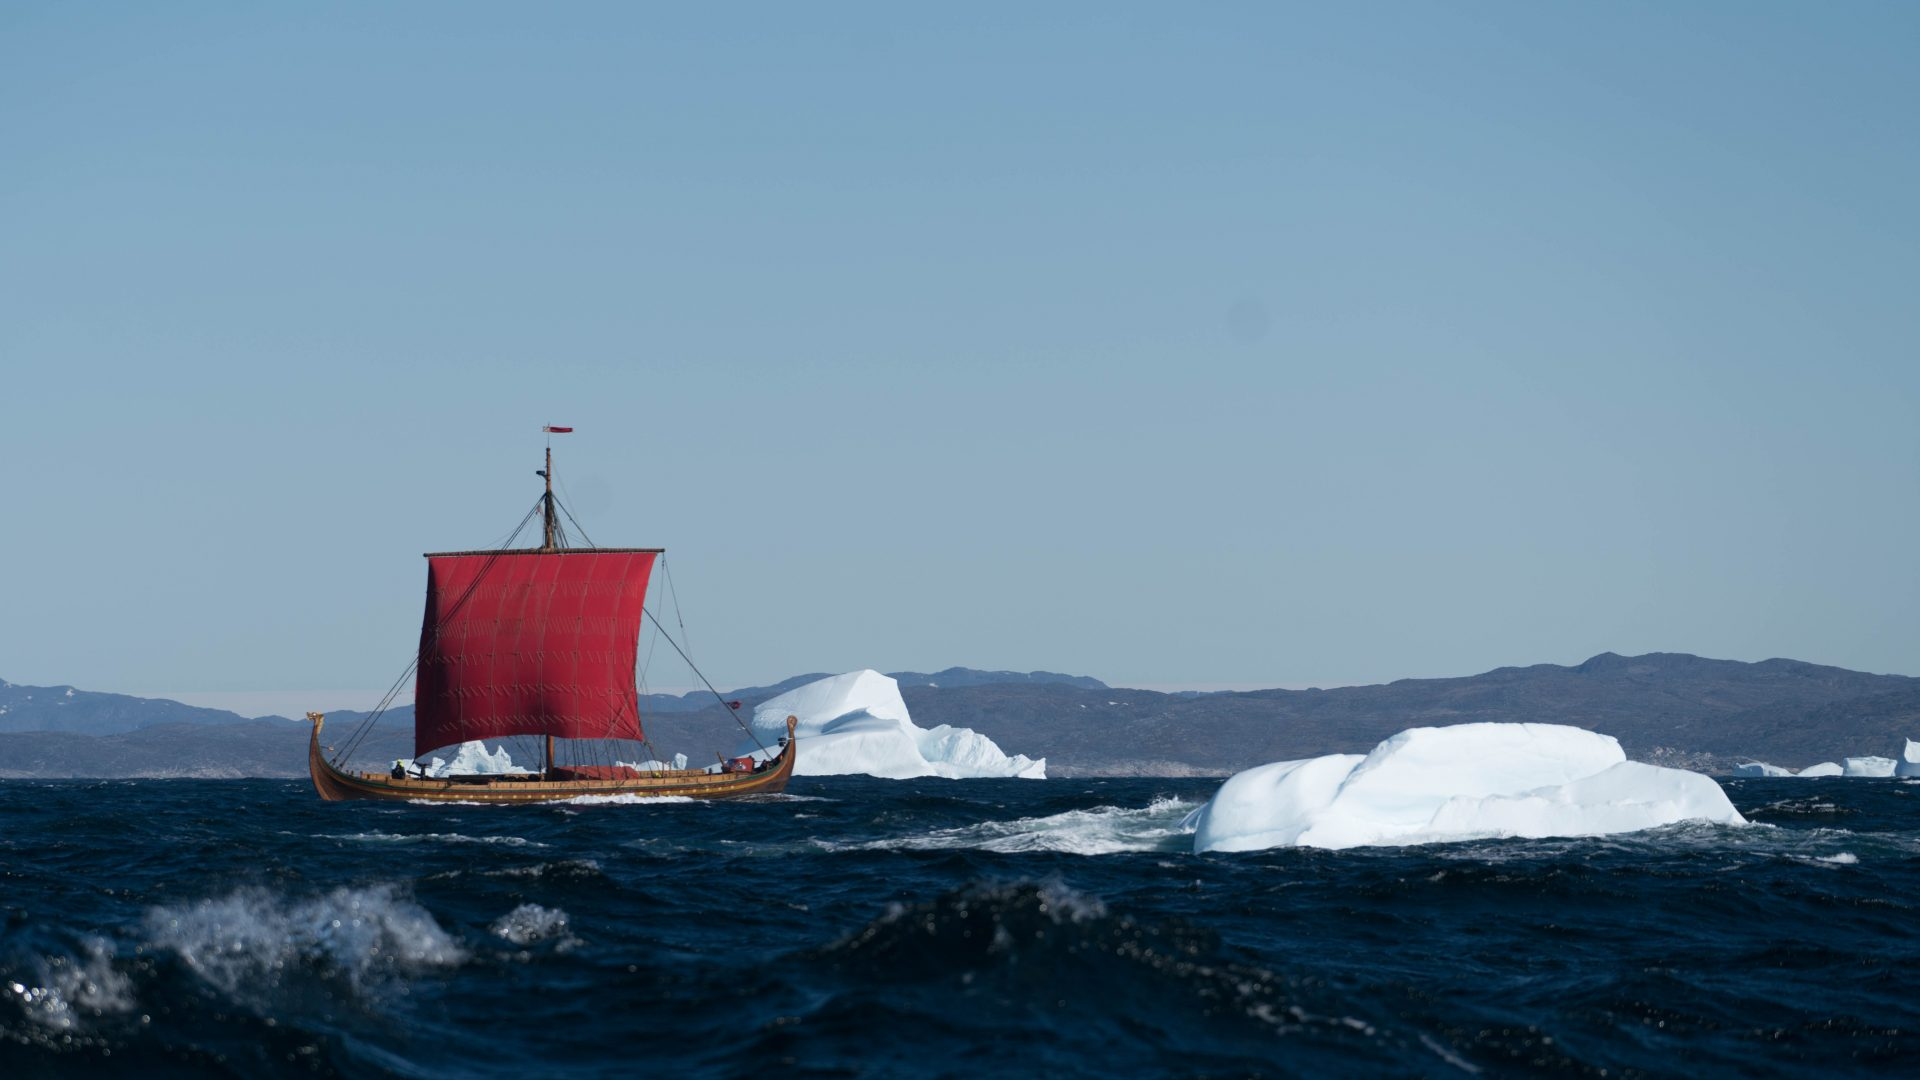 11-DSC6567Leaving-Greenland-1920x1080.jpg